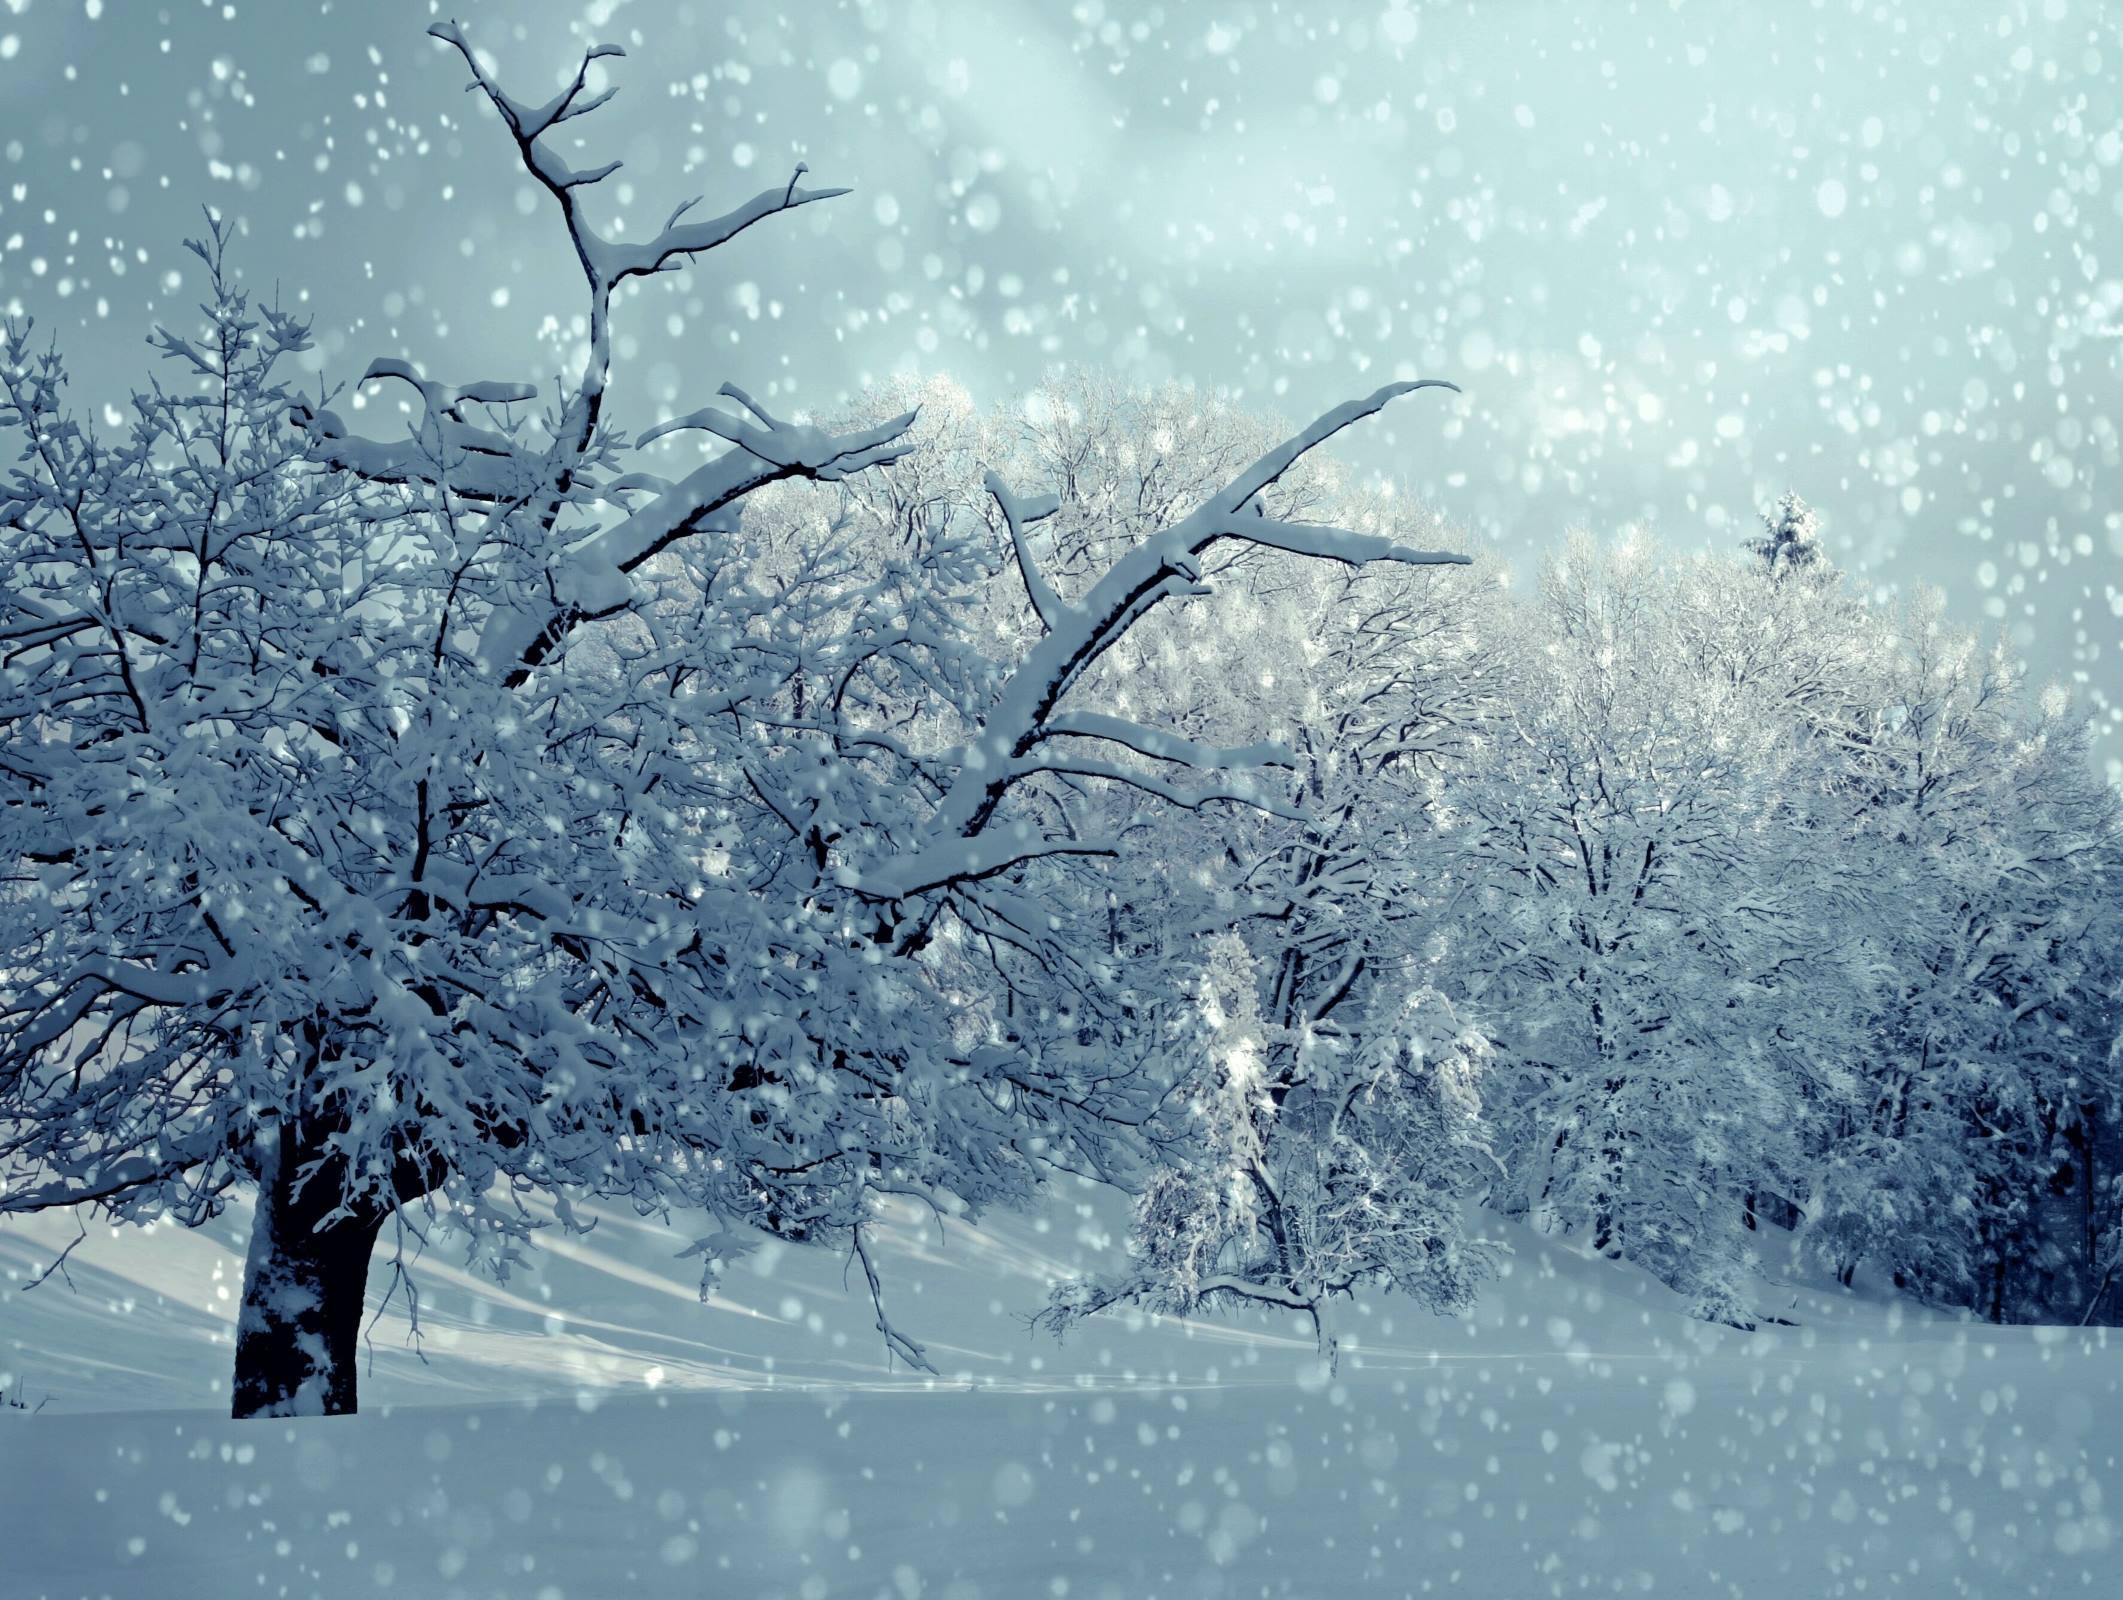 winter snowing snow trees